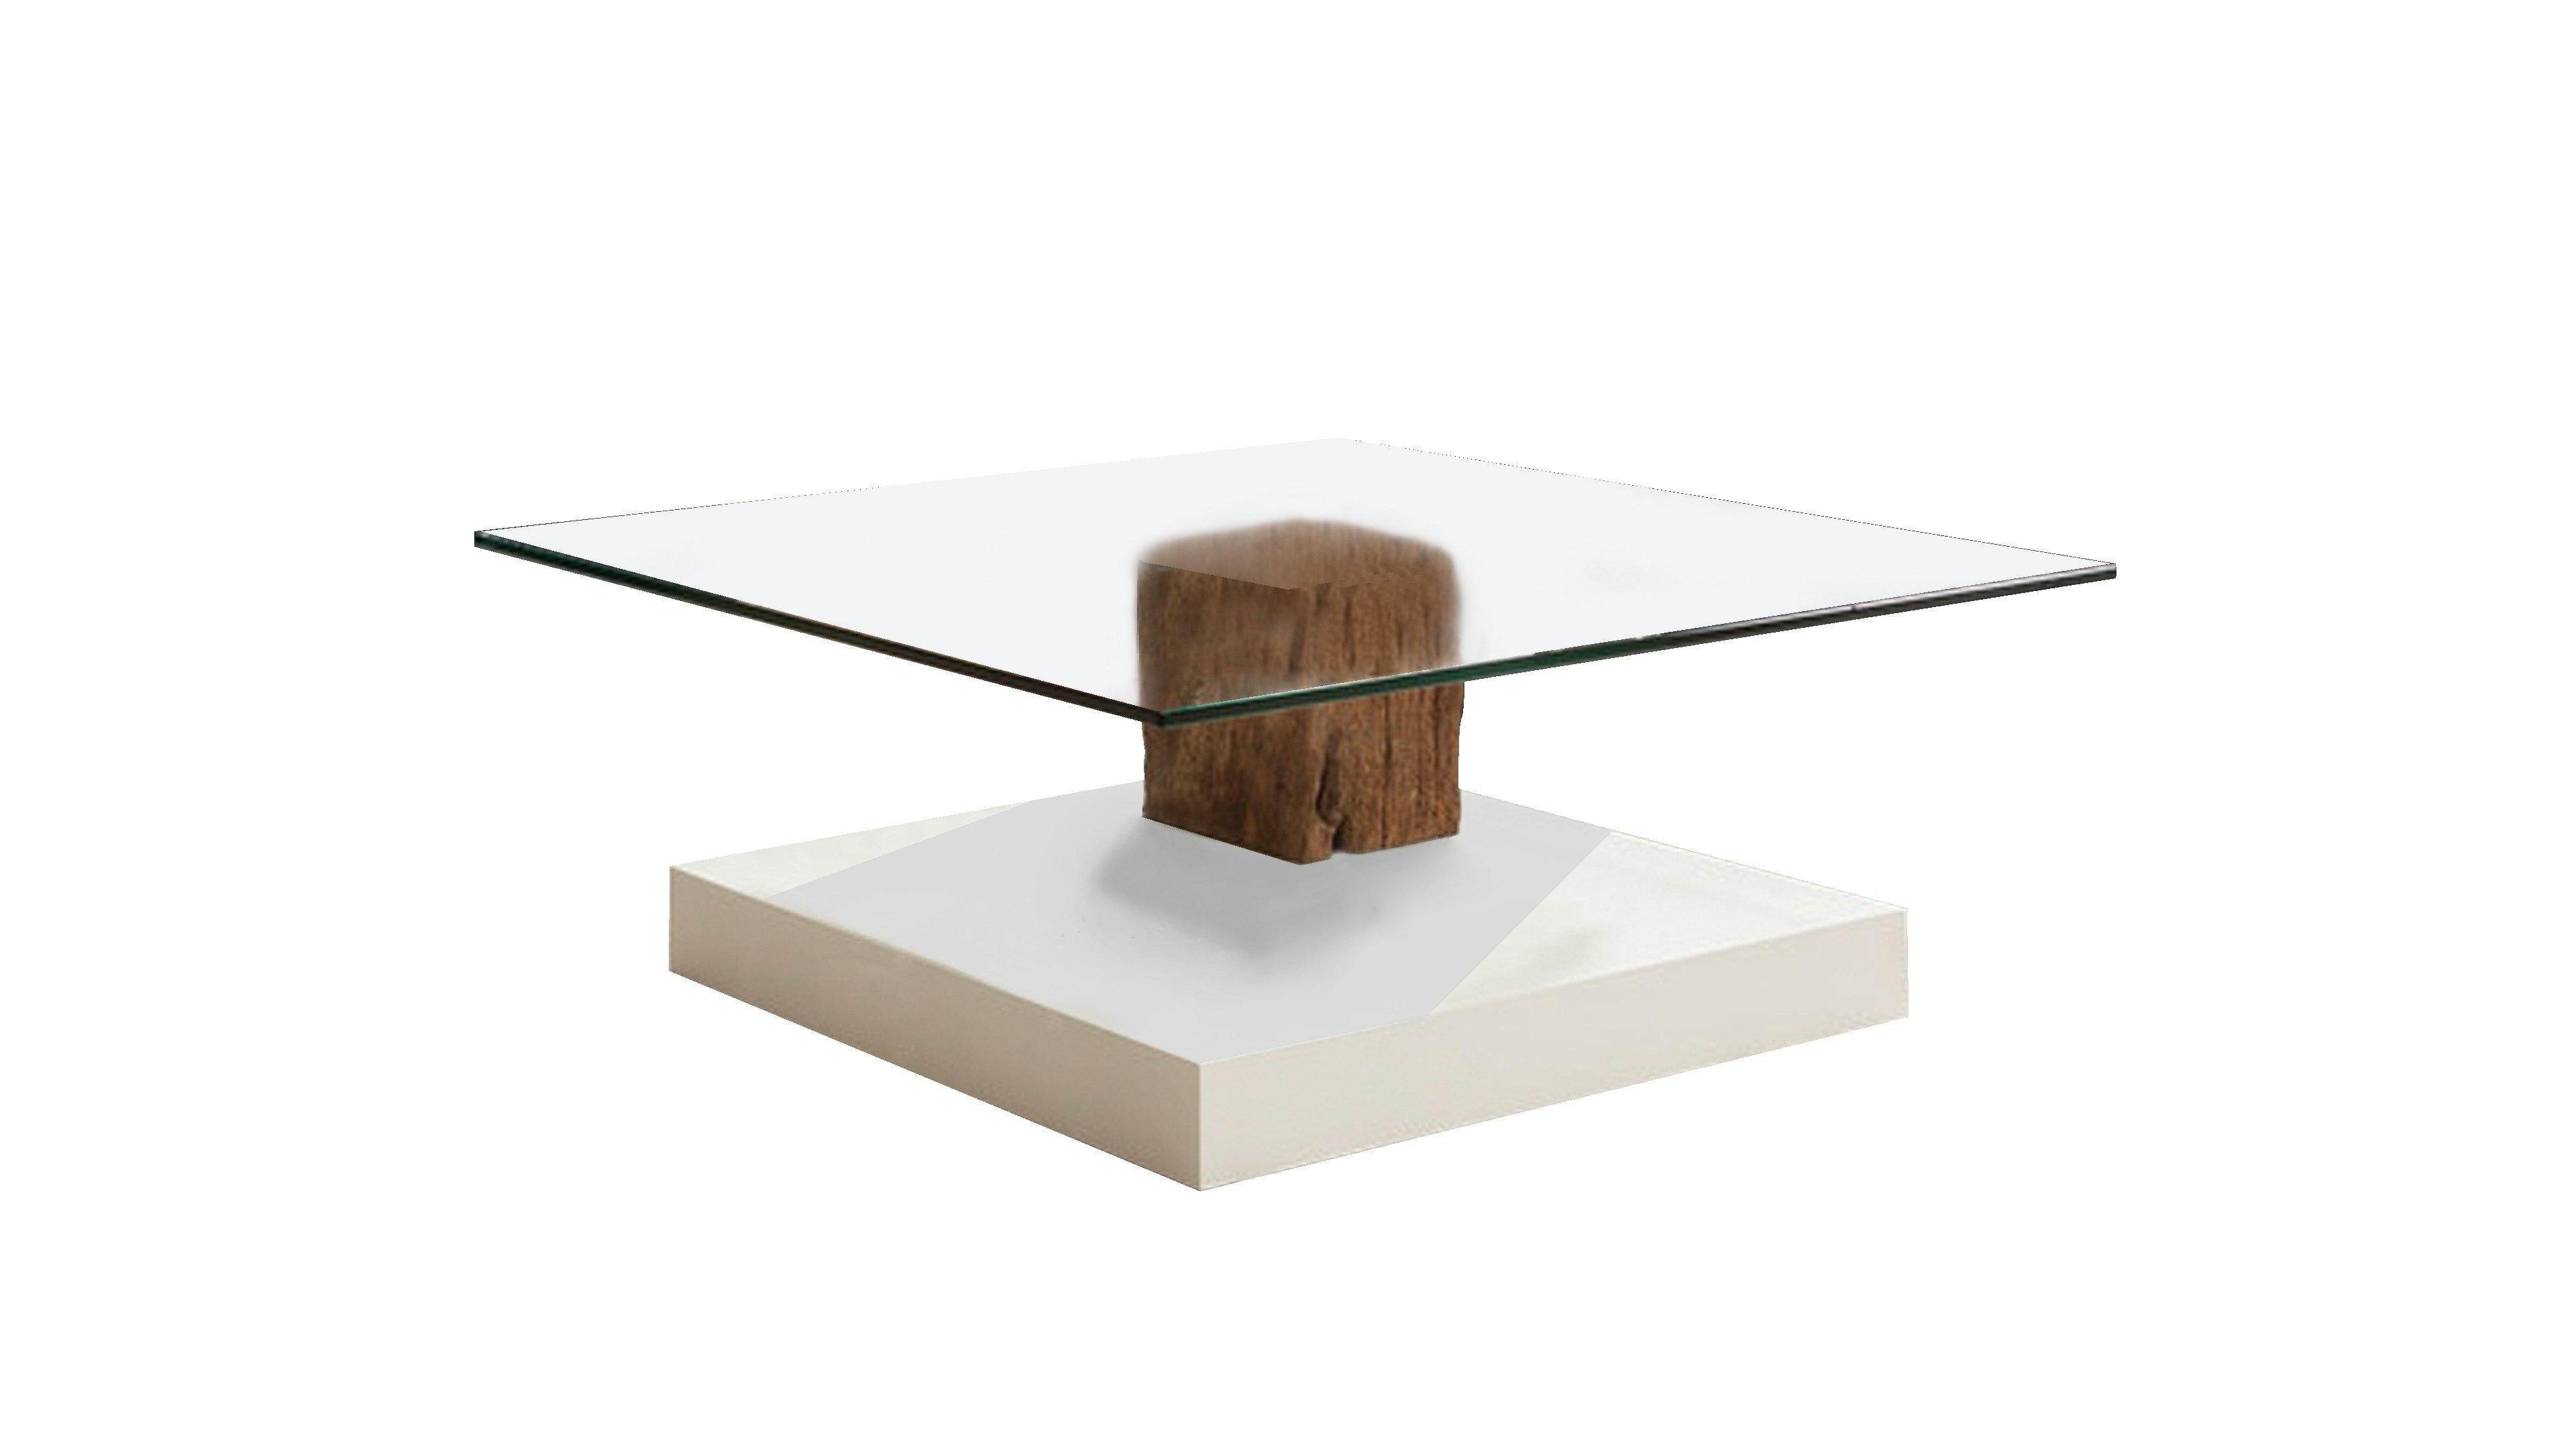 Couchtisch 4400-2419 Bodenplatte Lack weiss matt